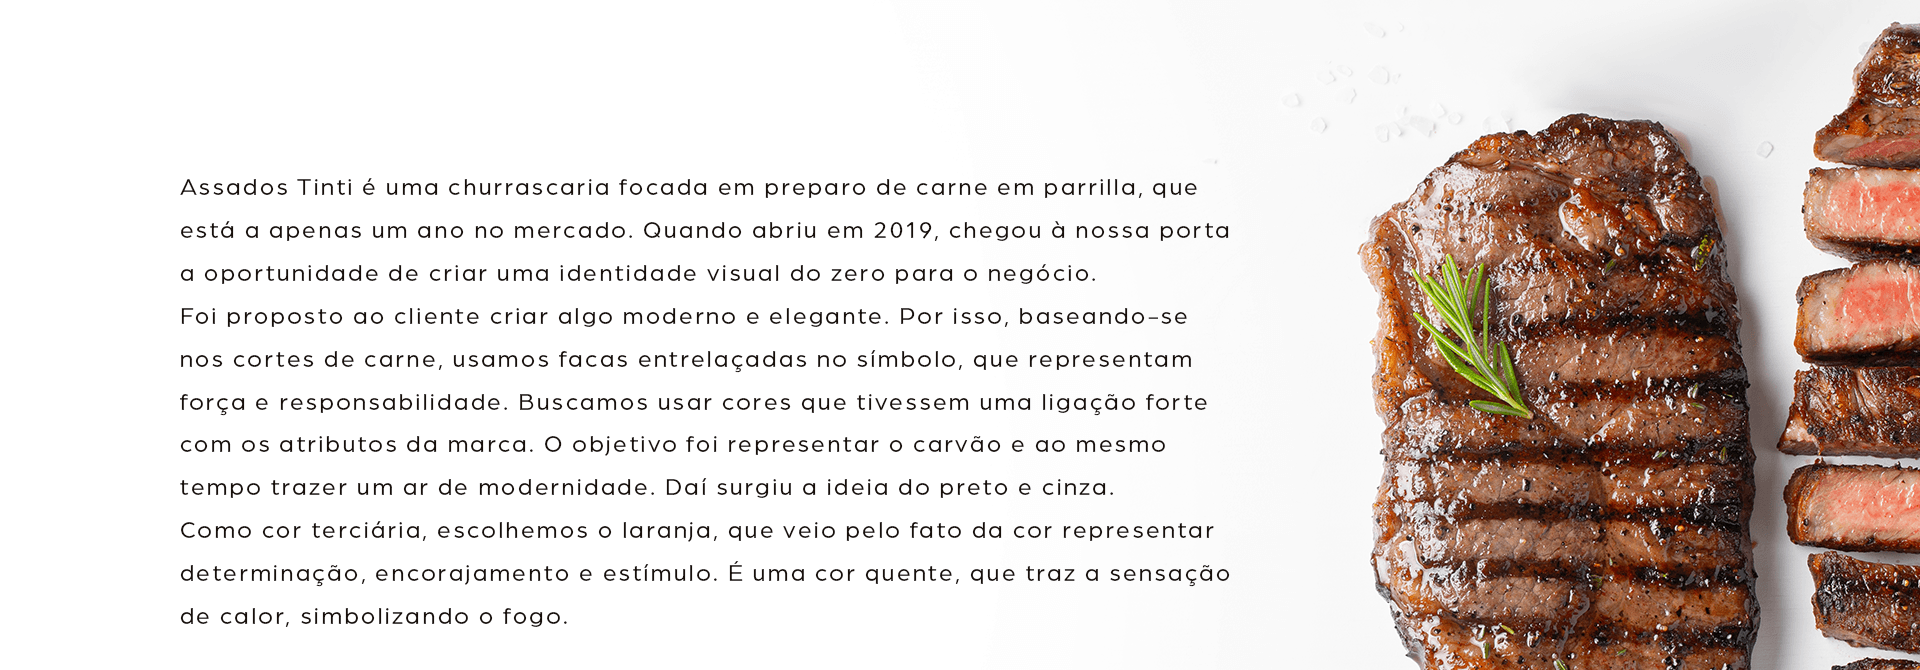 Prancheta 2